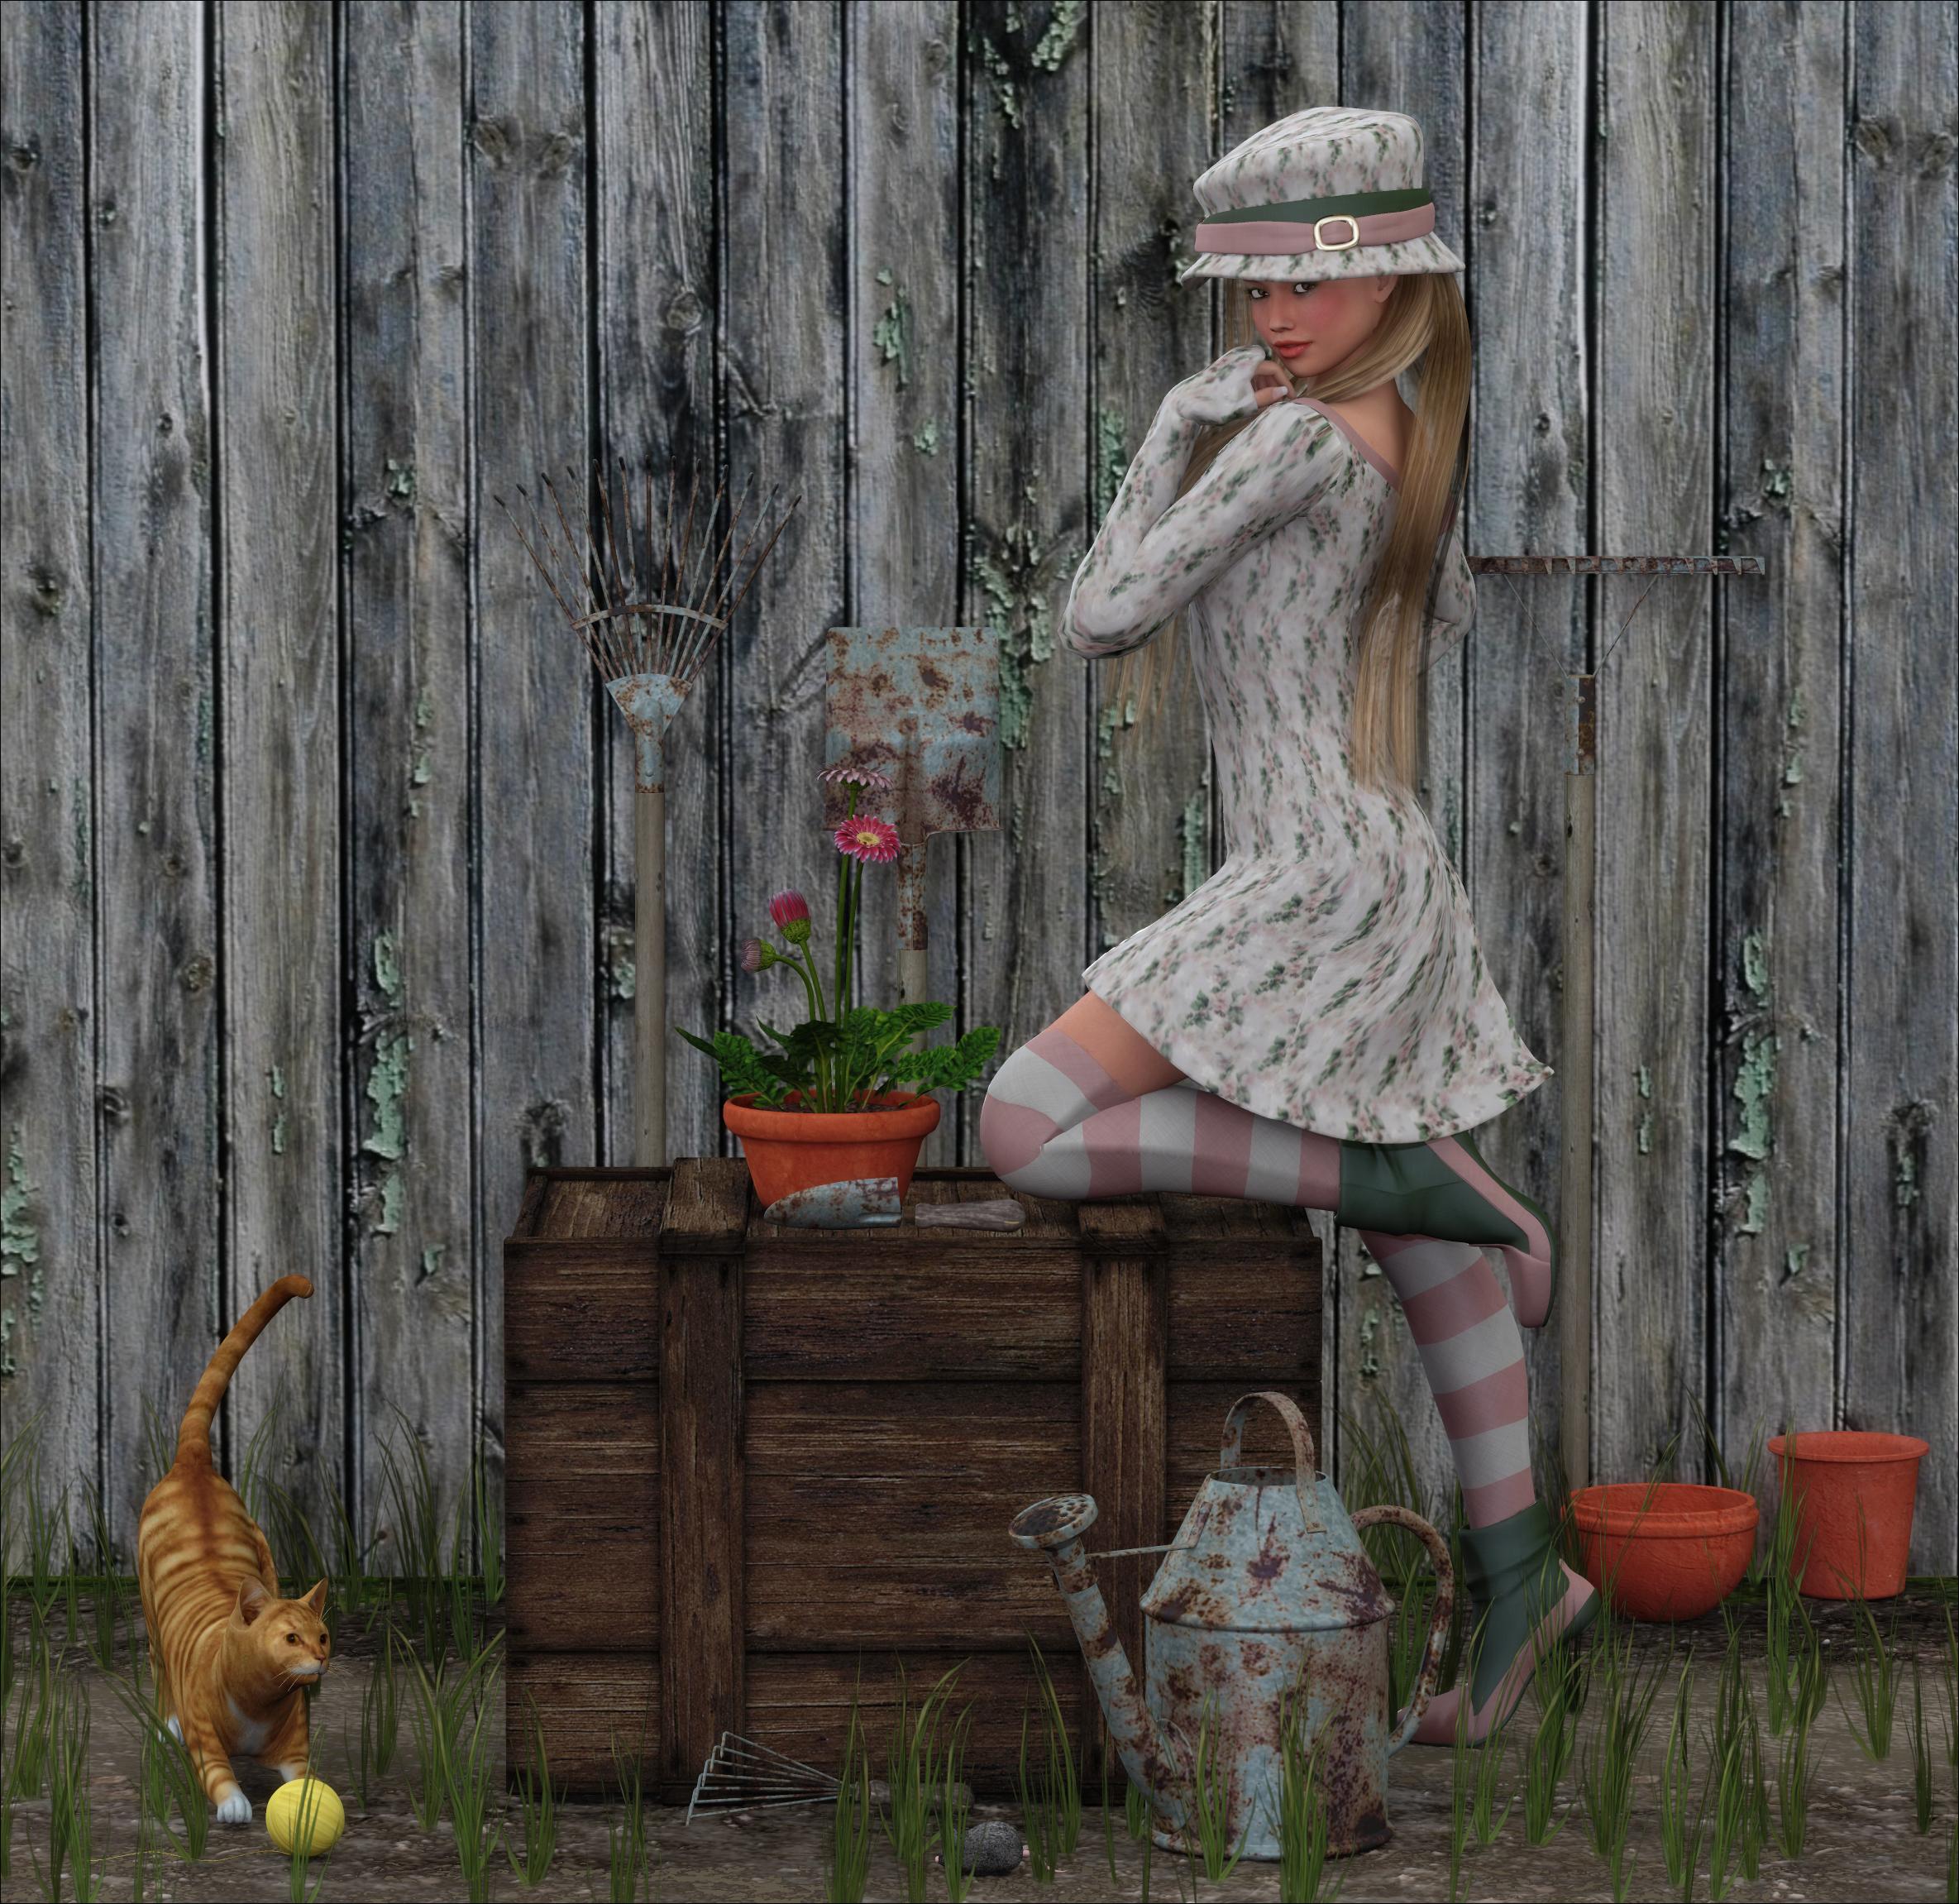 garden shabby chic by frollein zombie on deviantart. Black Bedroom Furniture Sets. Home Design Ideas